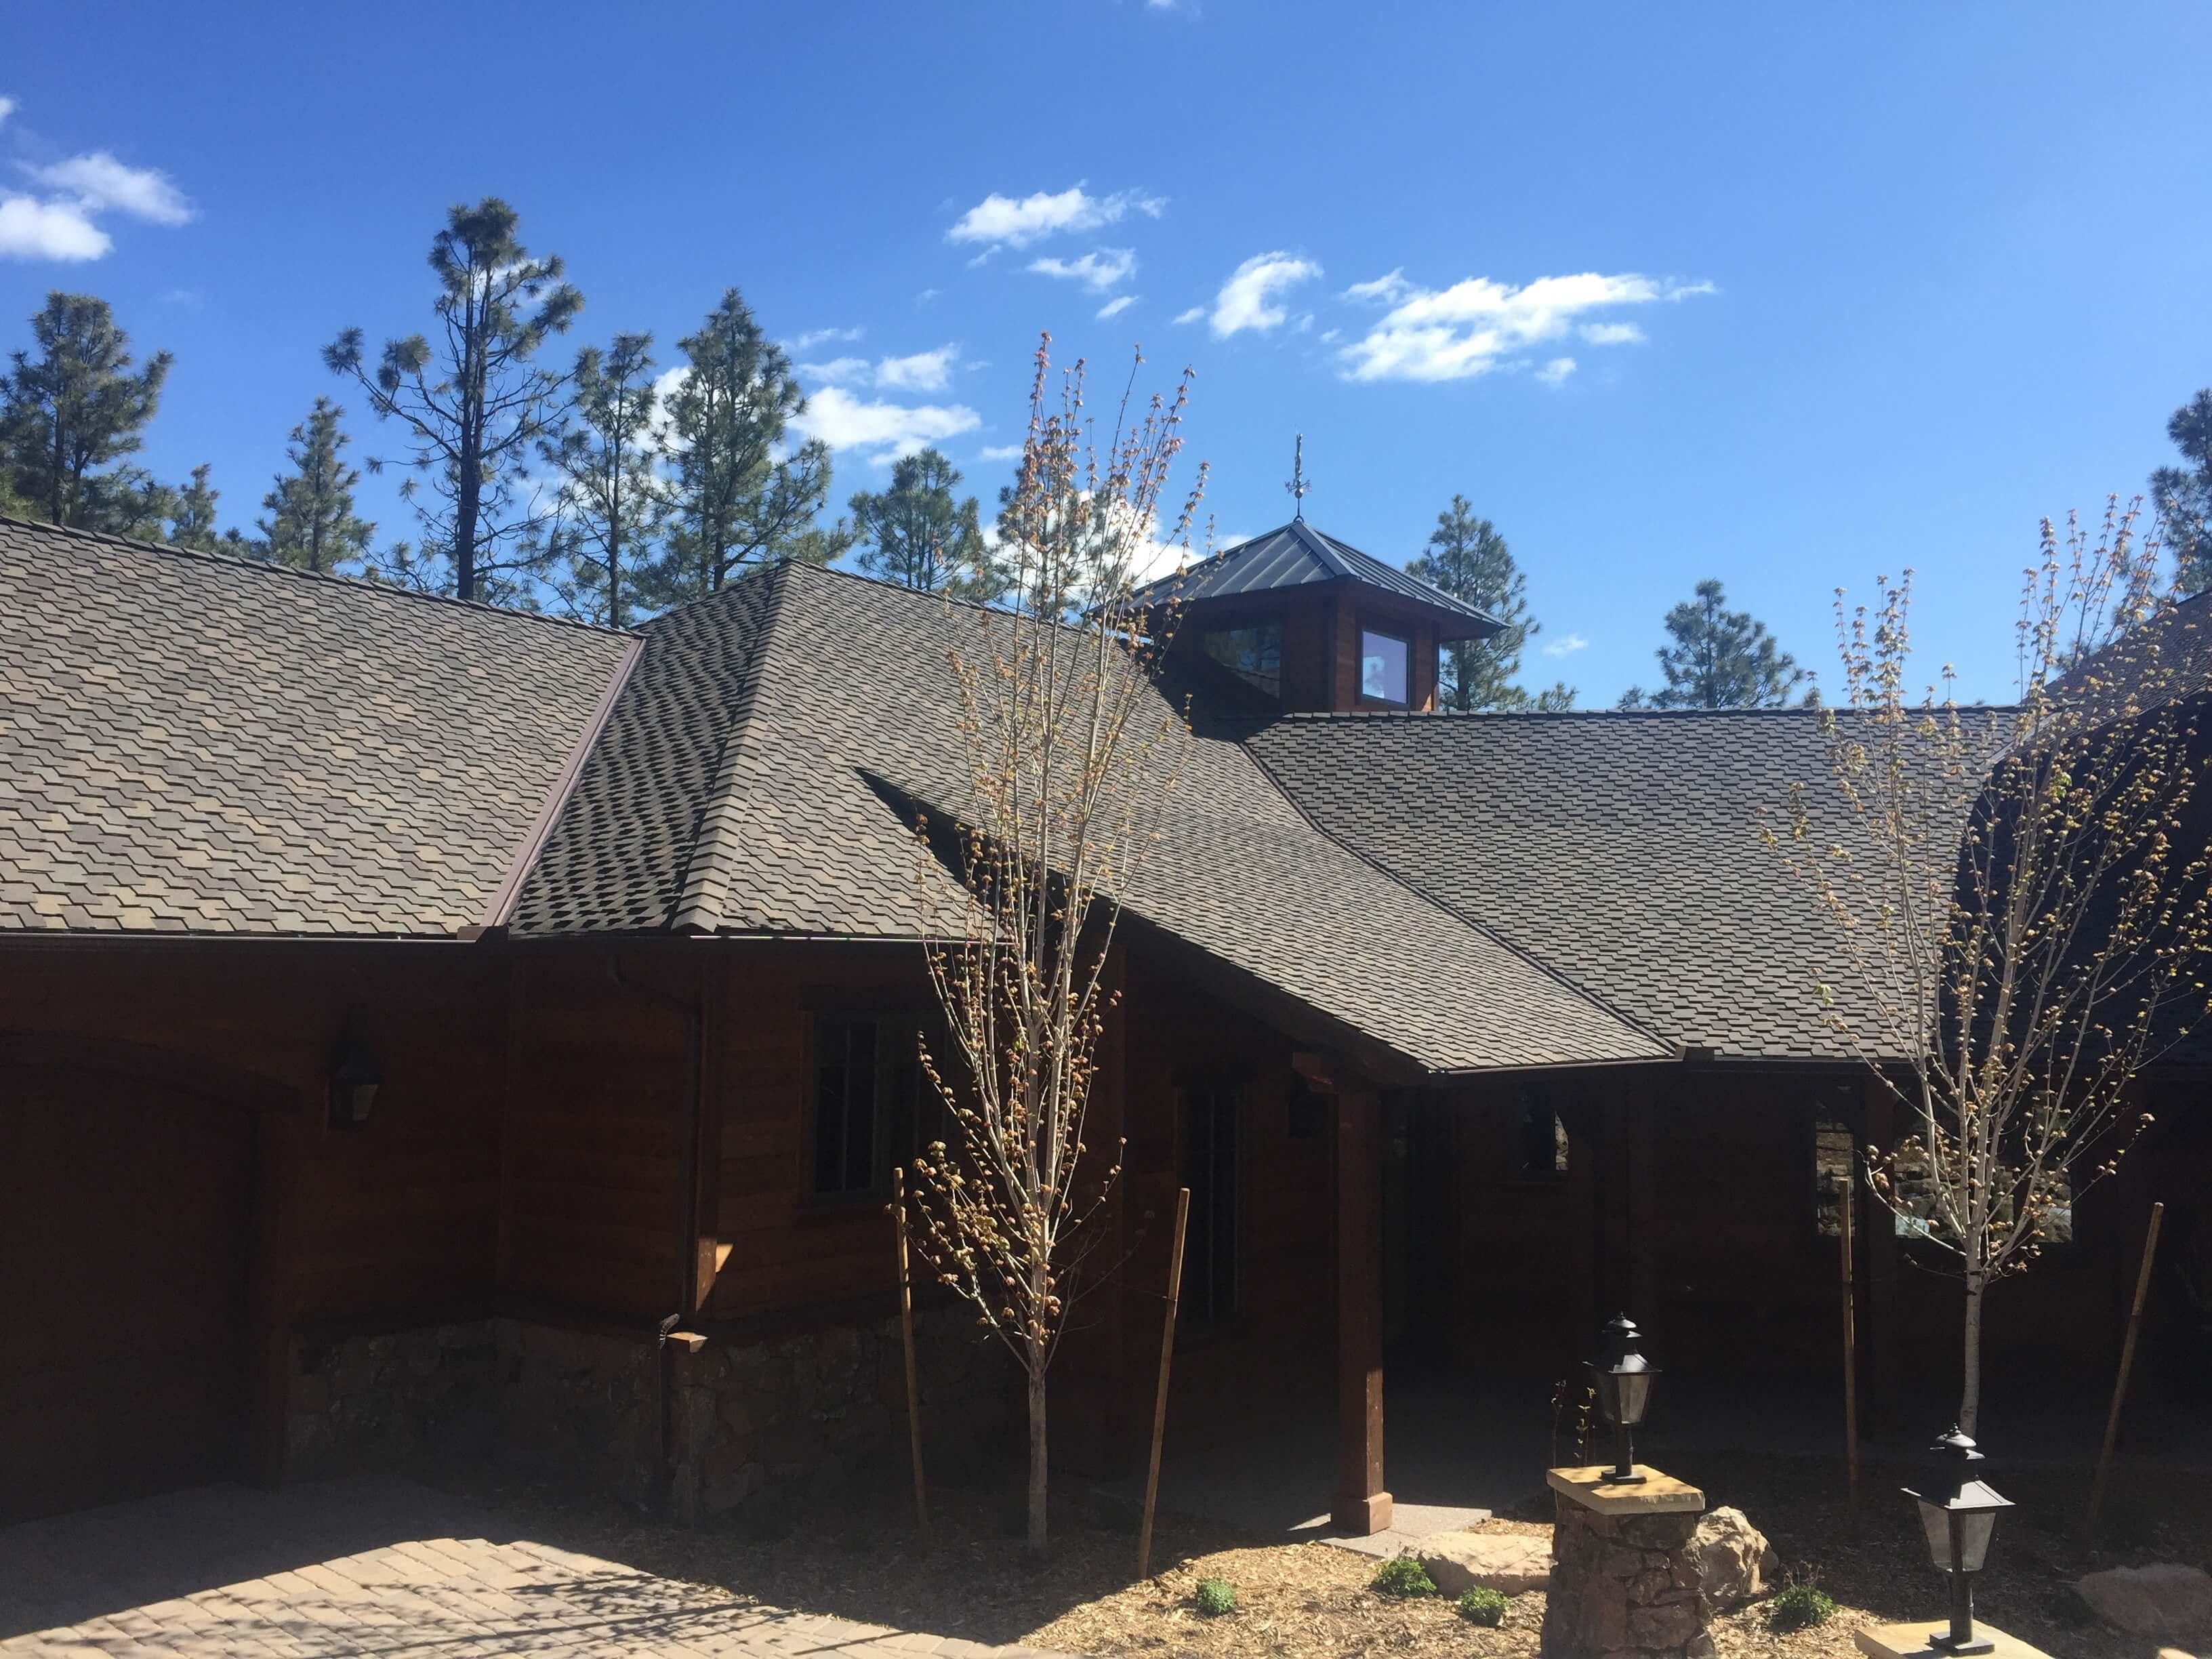 Shingle Roofing 3